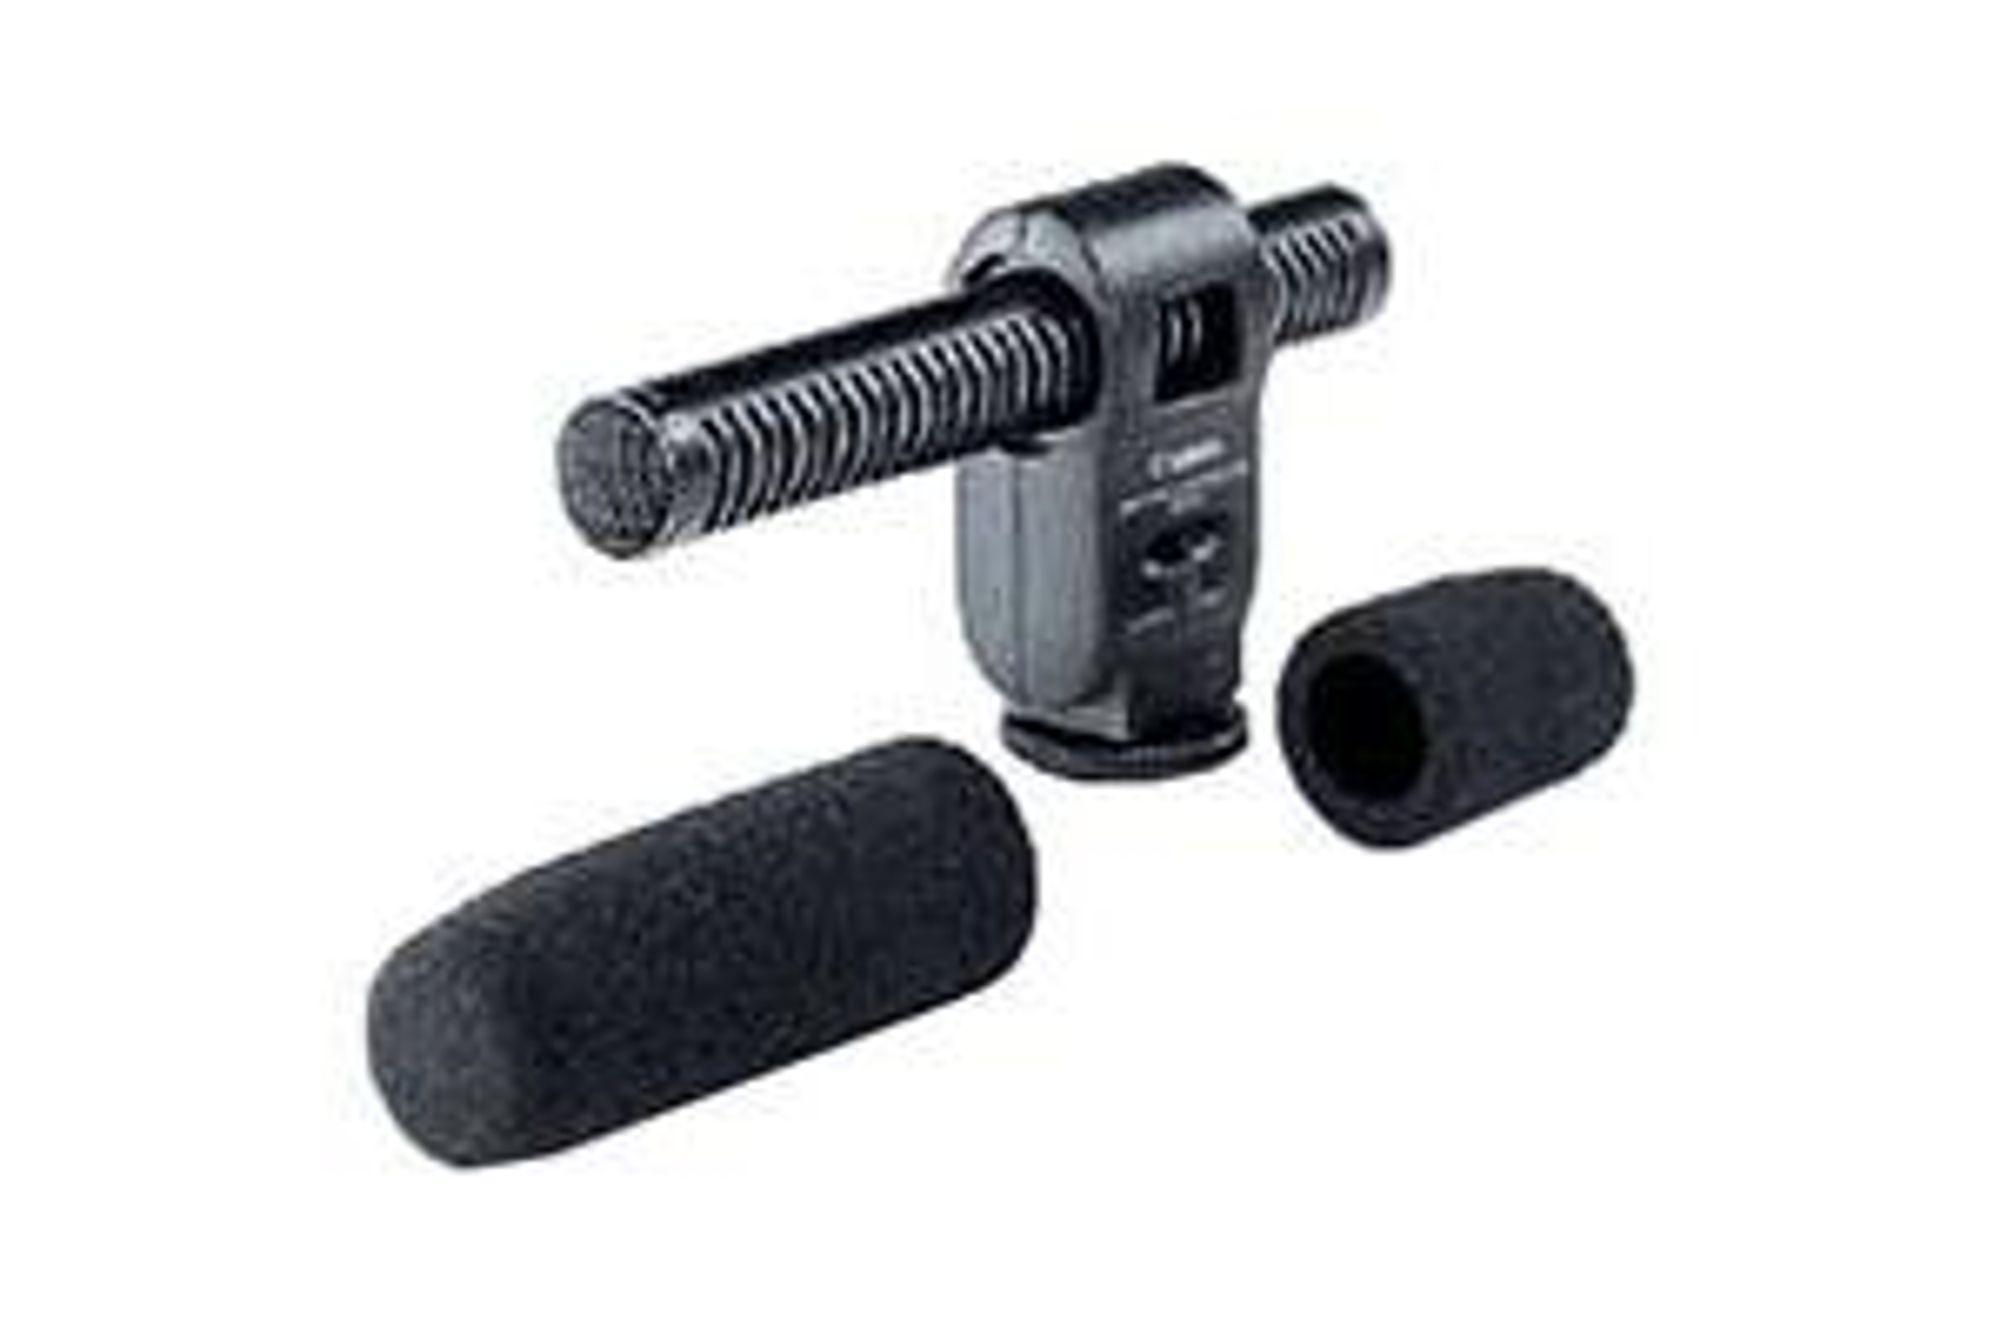 Canon DM-50 Stereo